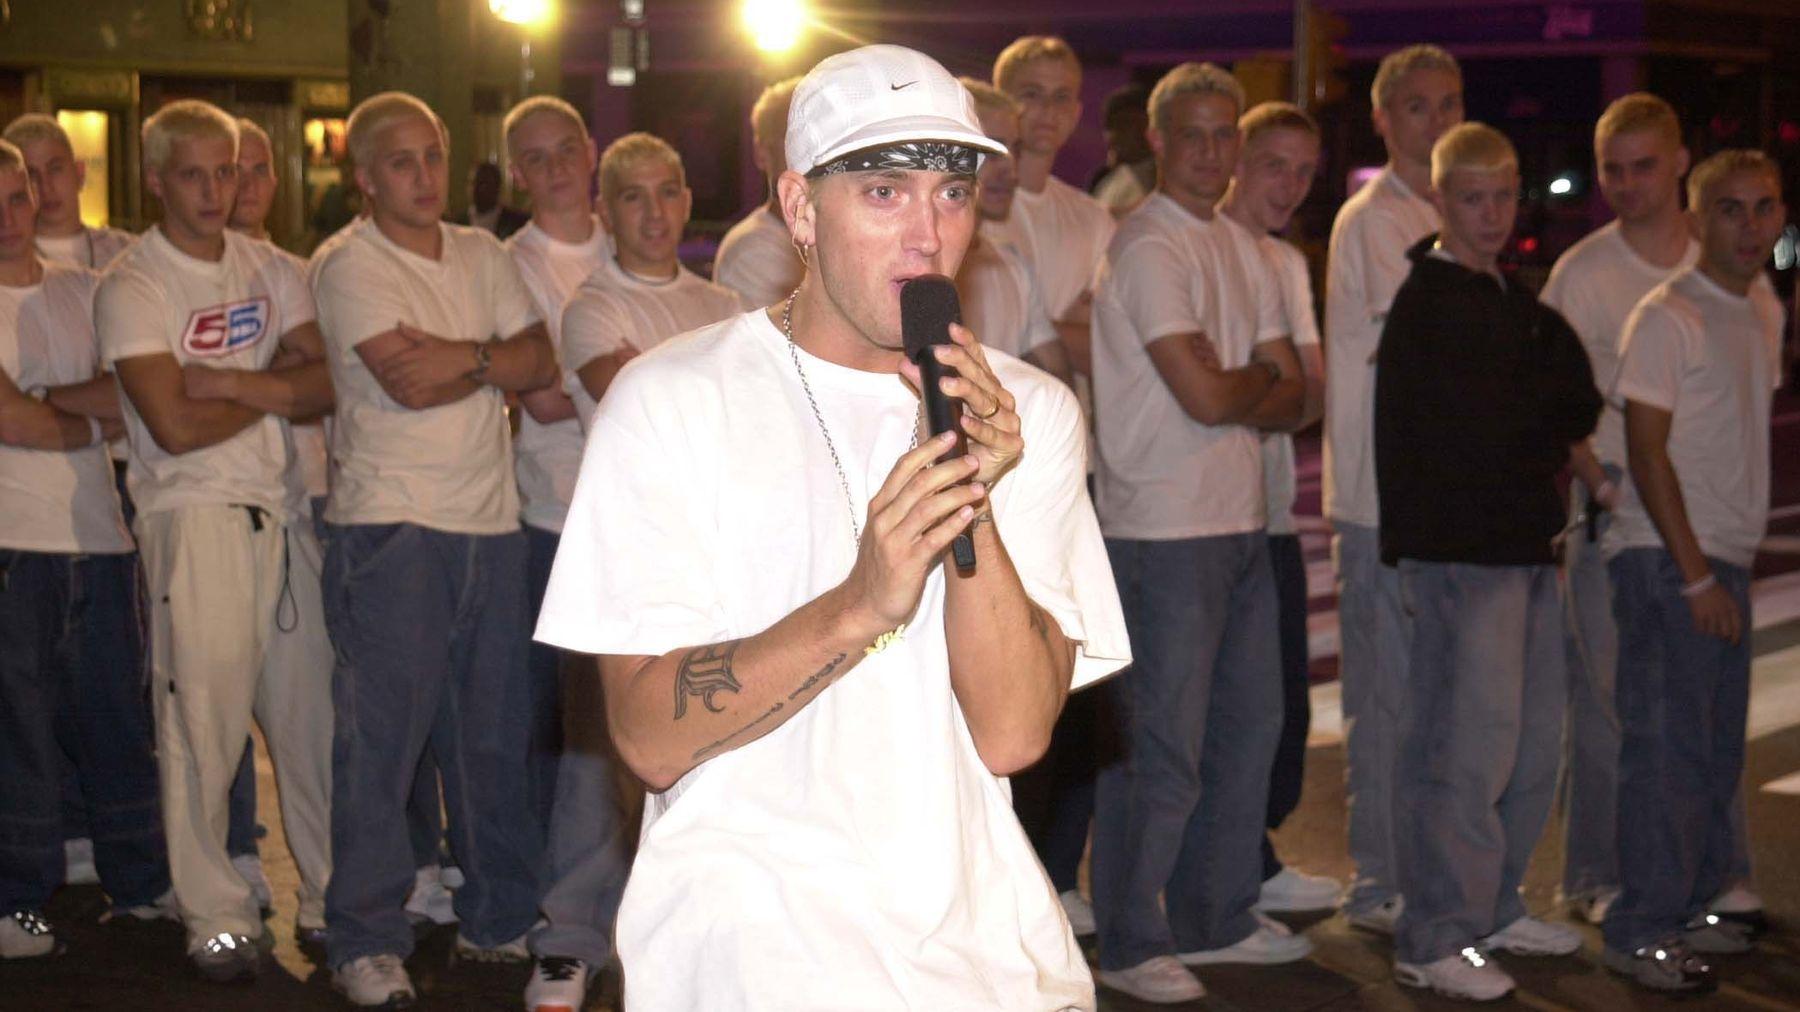 Eminem's 'The Way I Am' hits 100M views on YouTube/Vevo